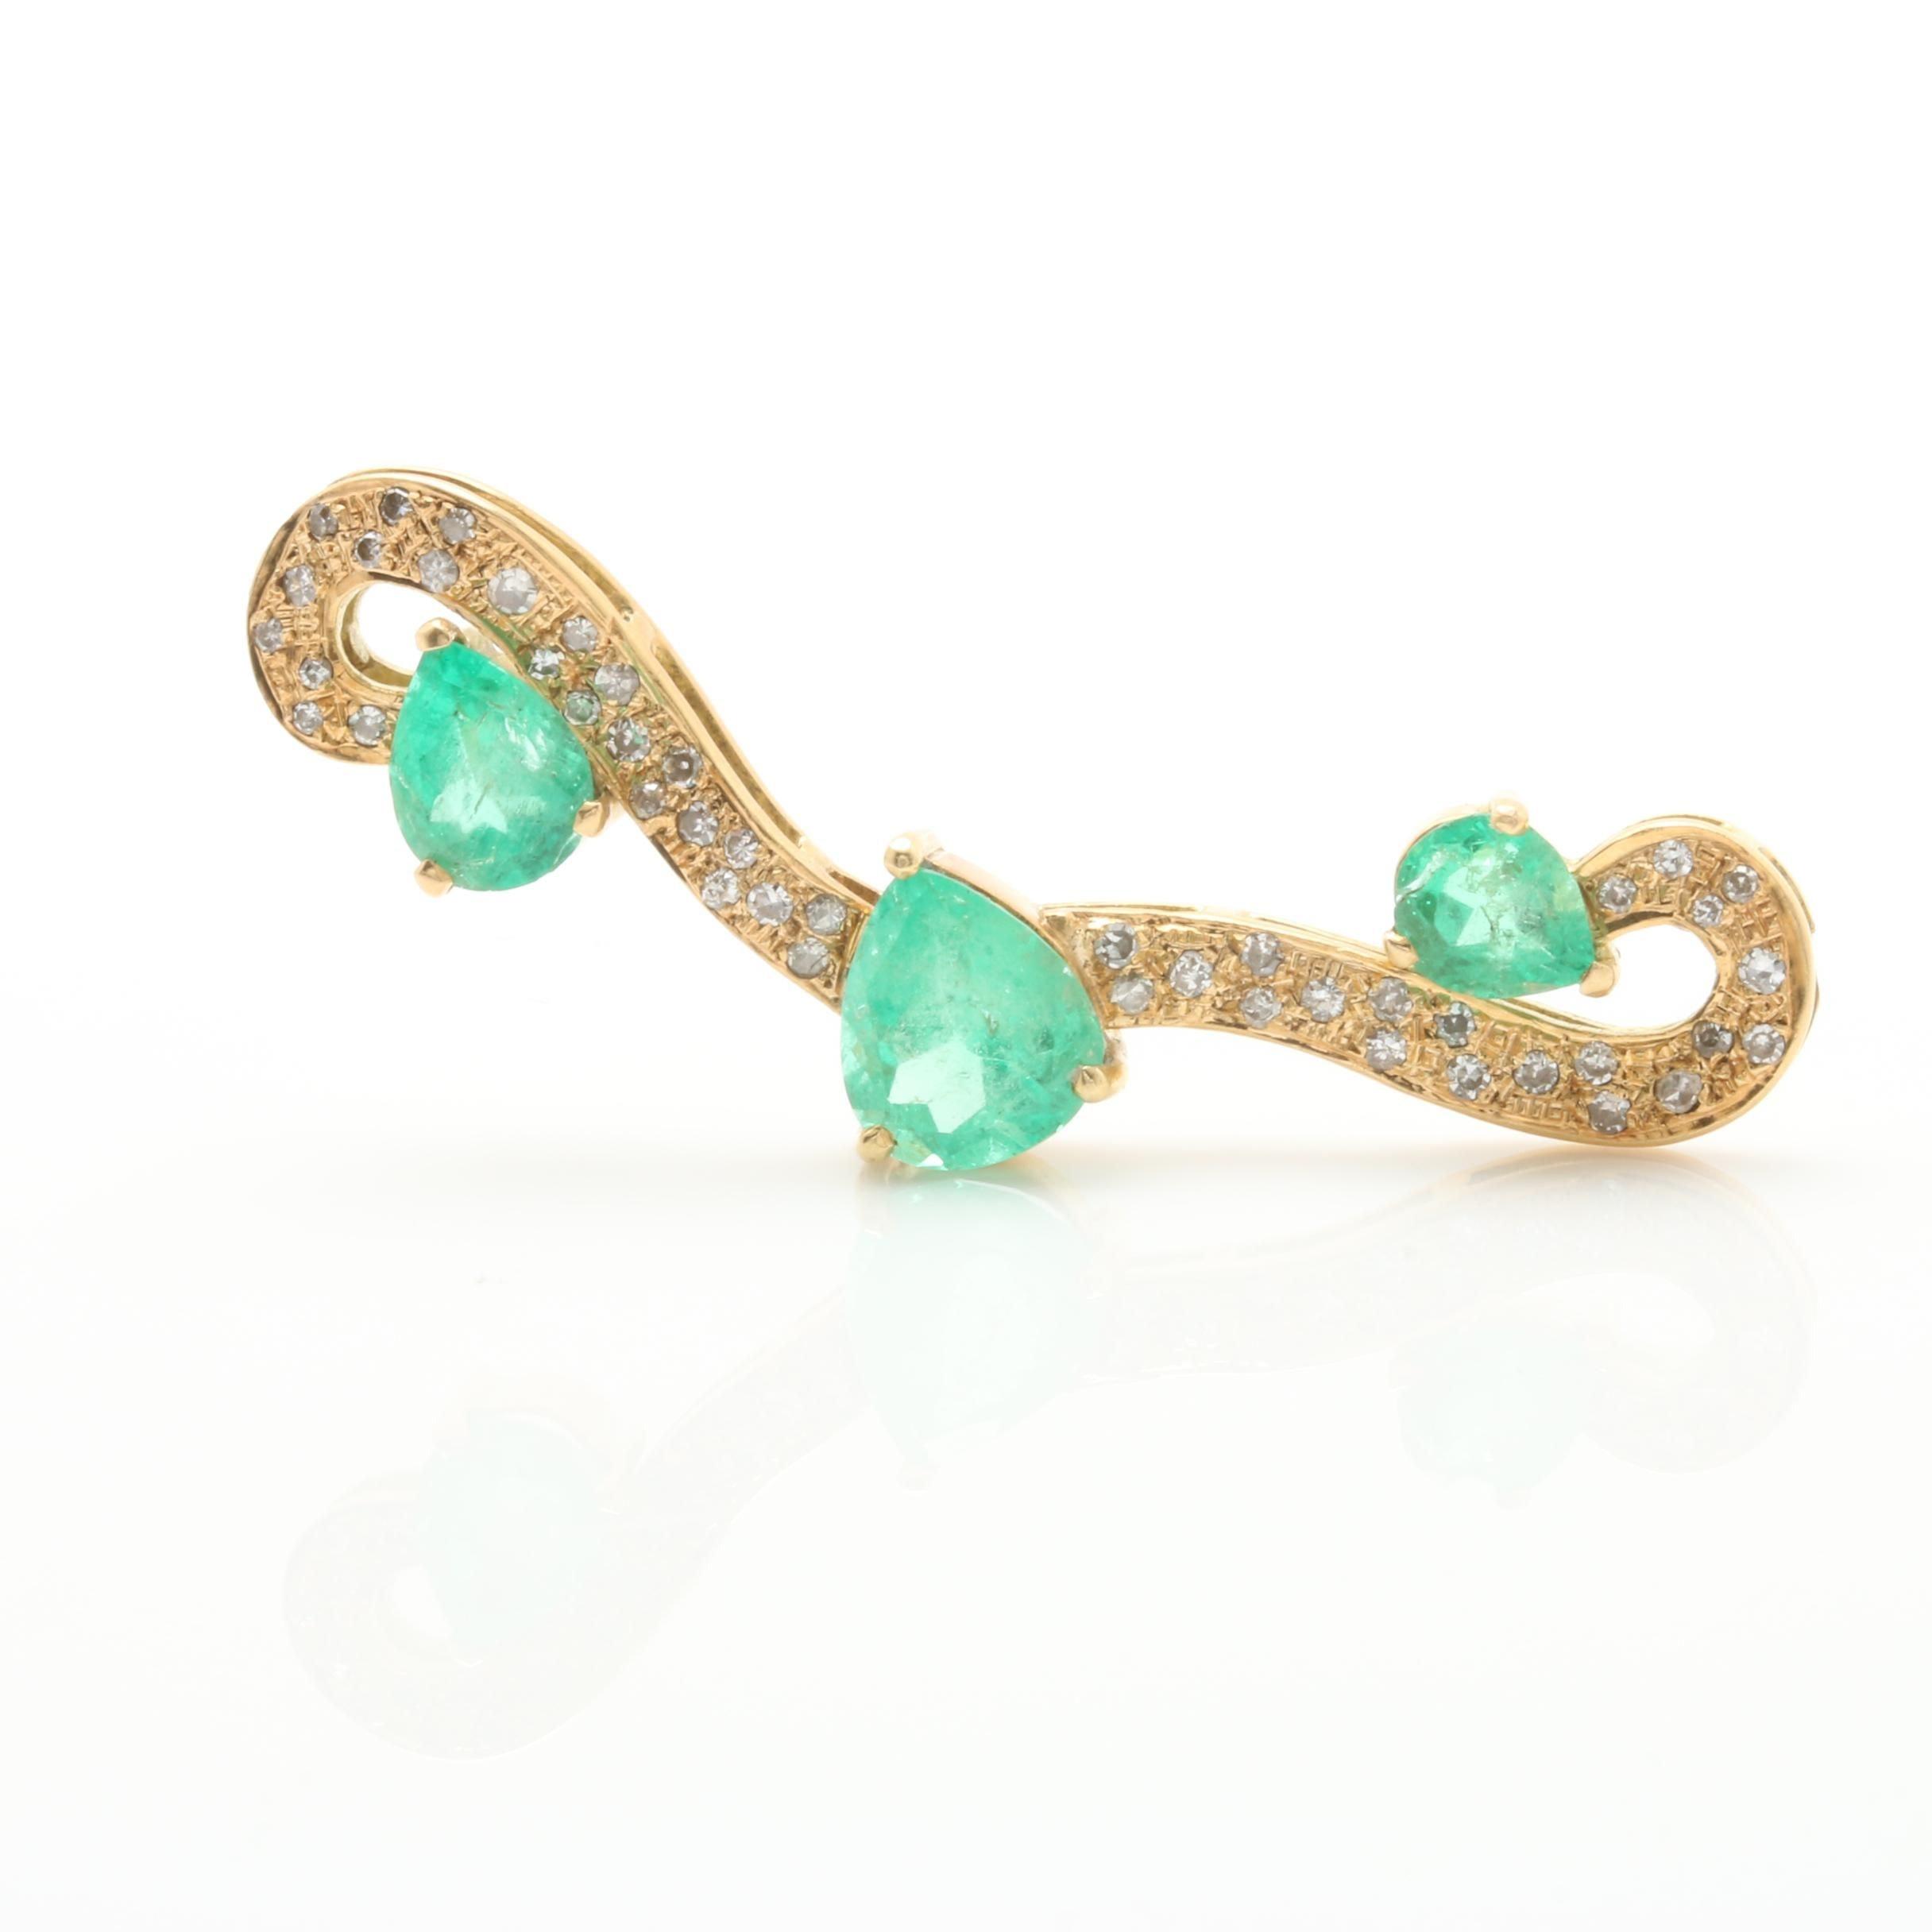 18K Yellow Gold 3.64 CTW Emerald and Diamond Pendant